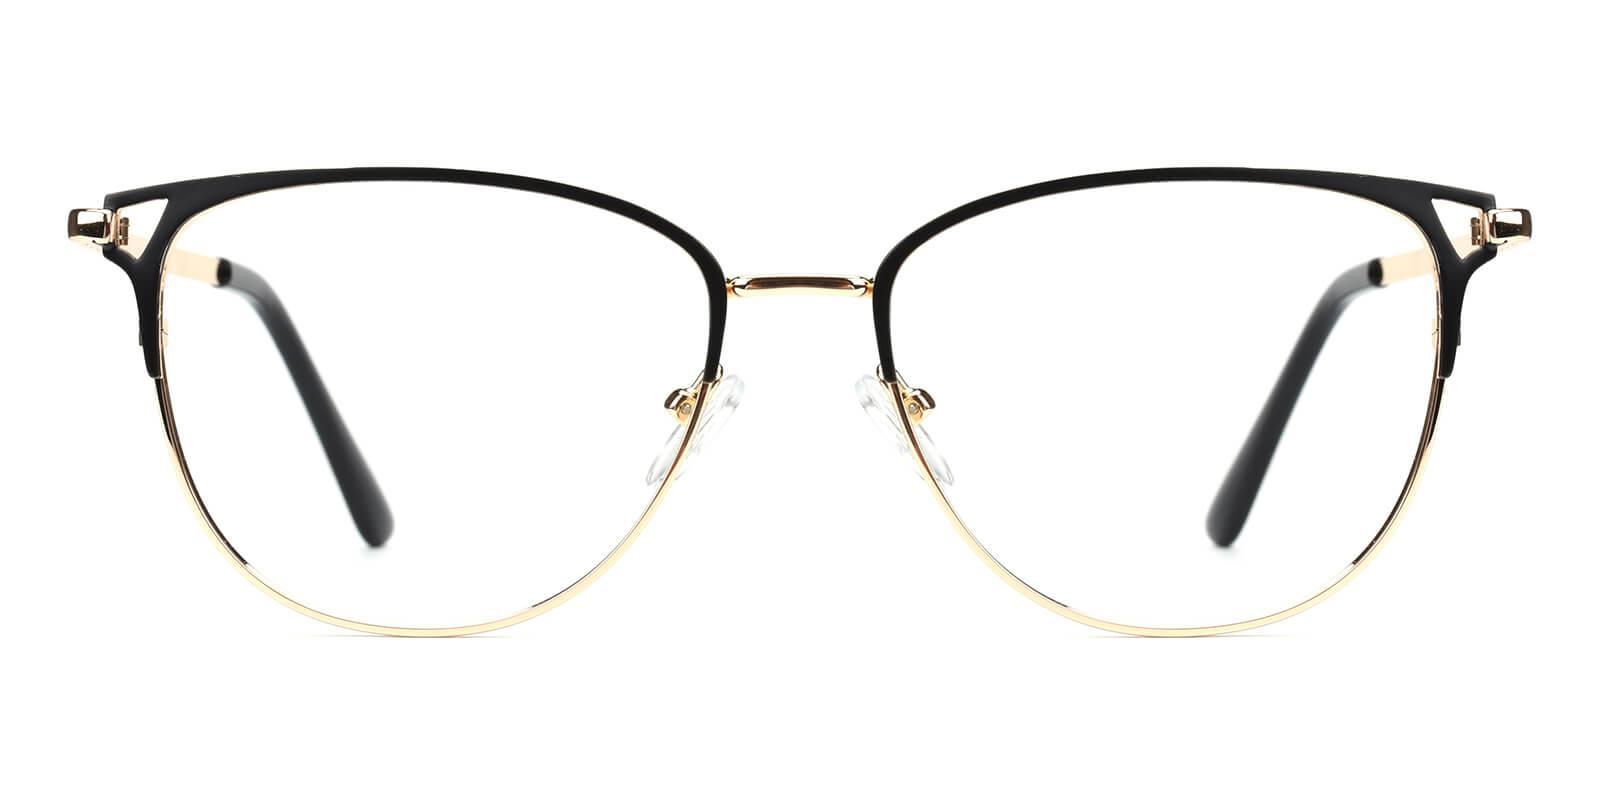 Geraldine-Black-Browline-Metal-Eyeglasses-additional2